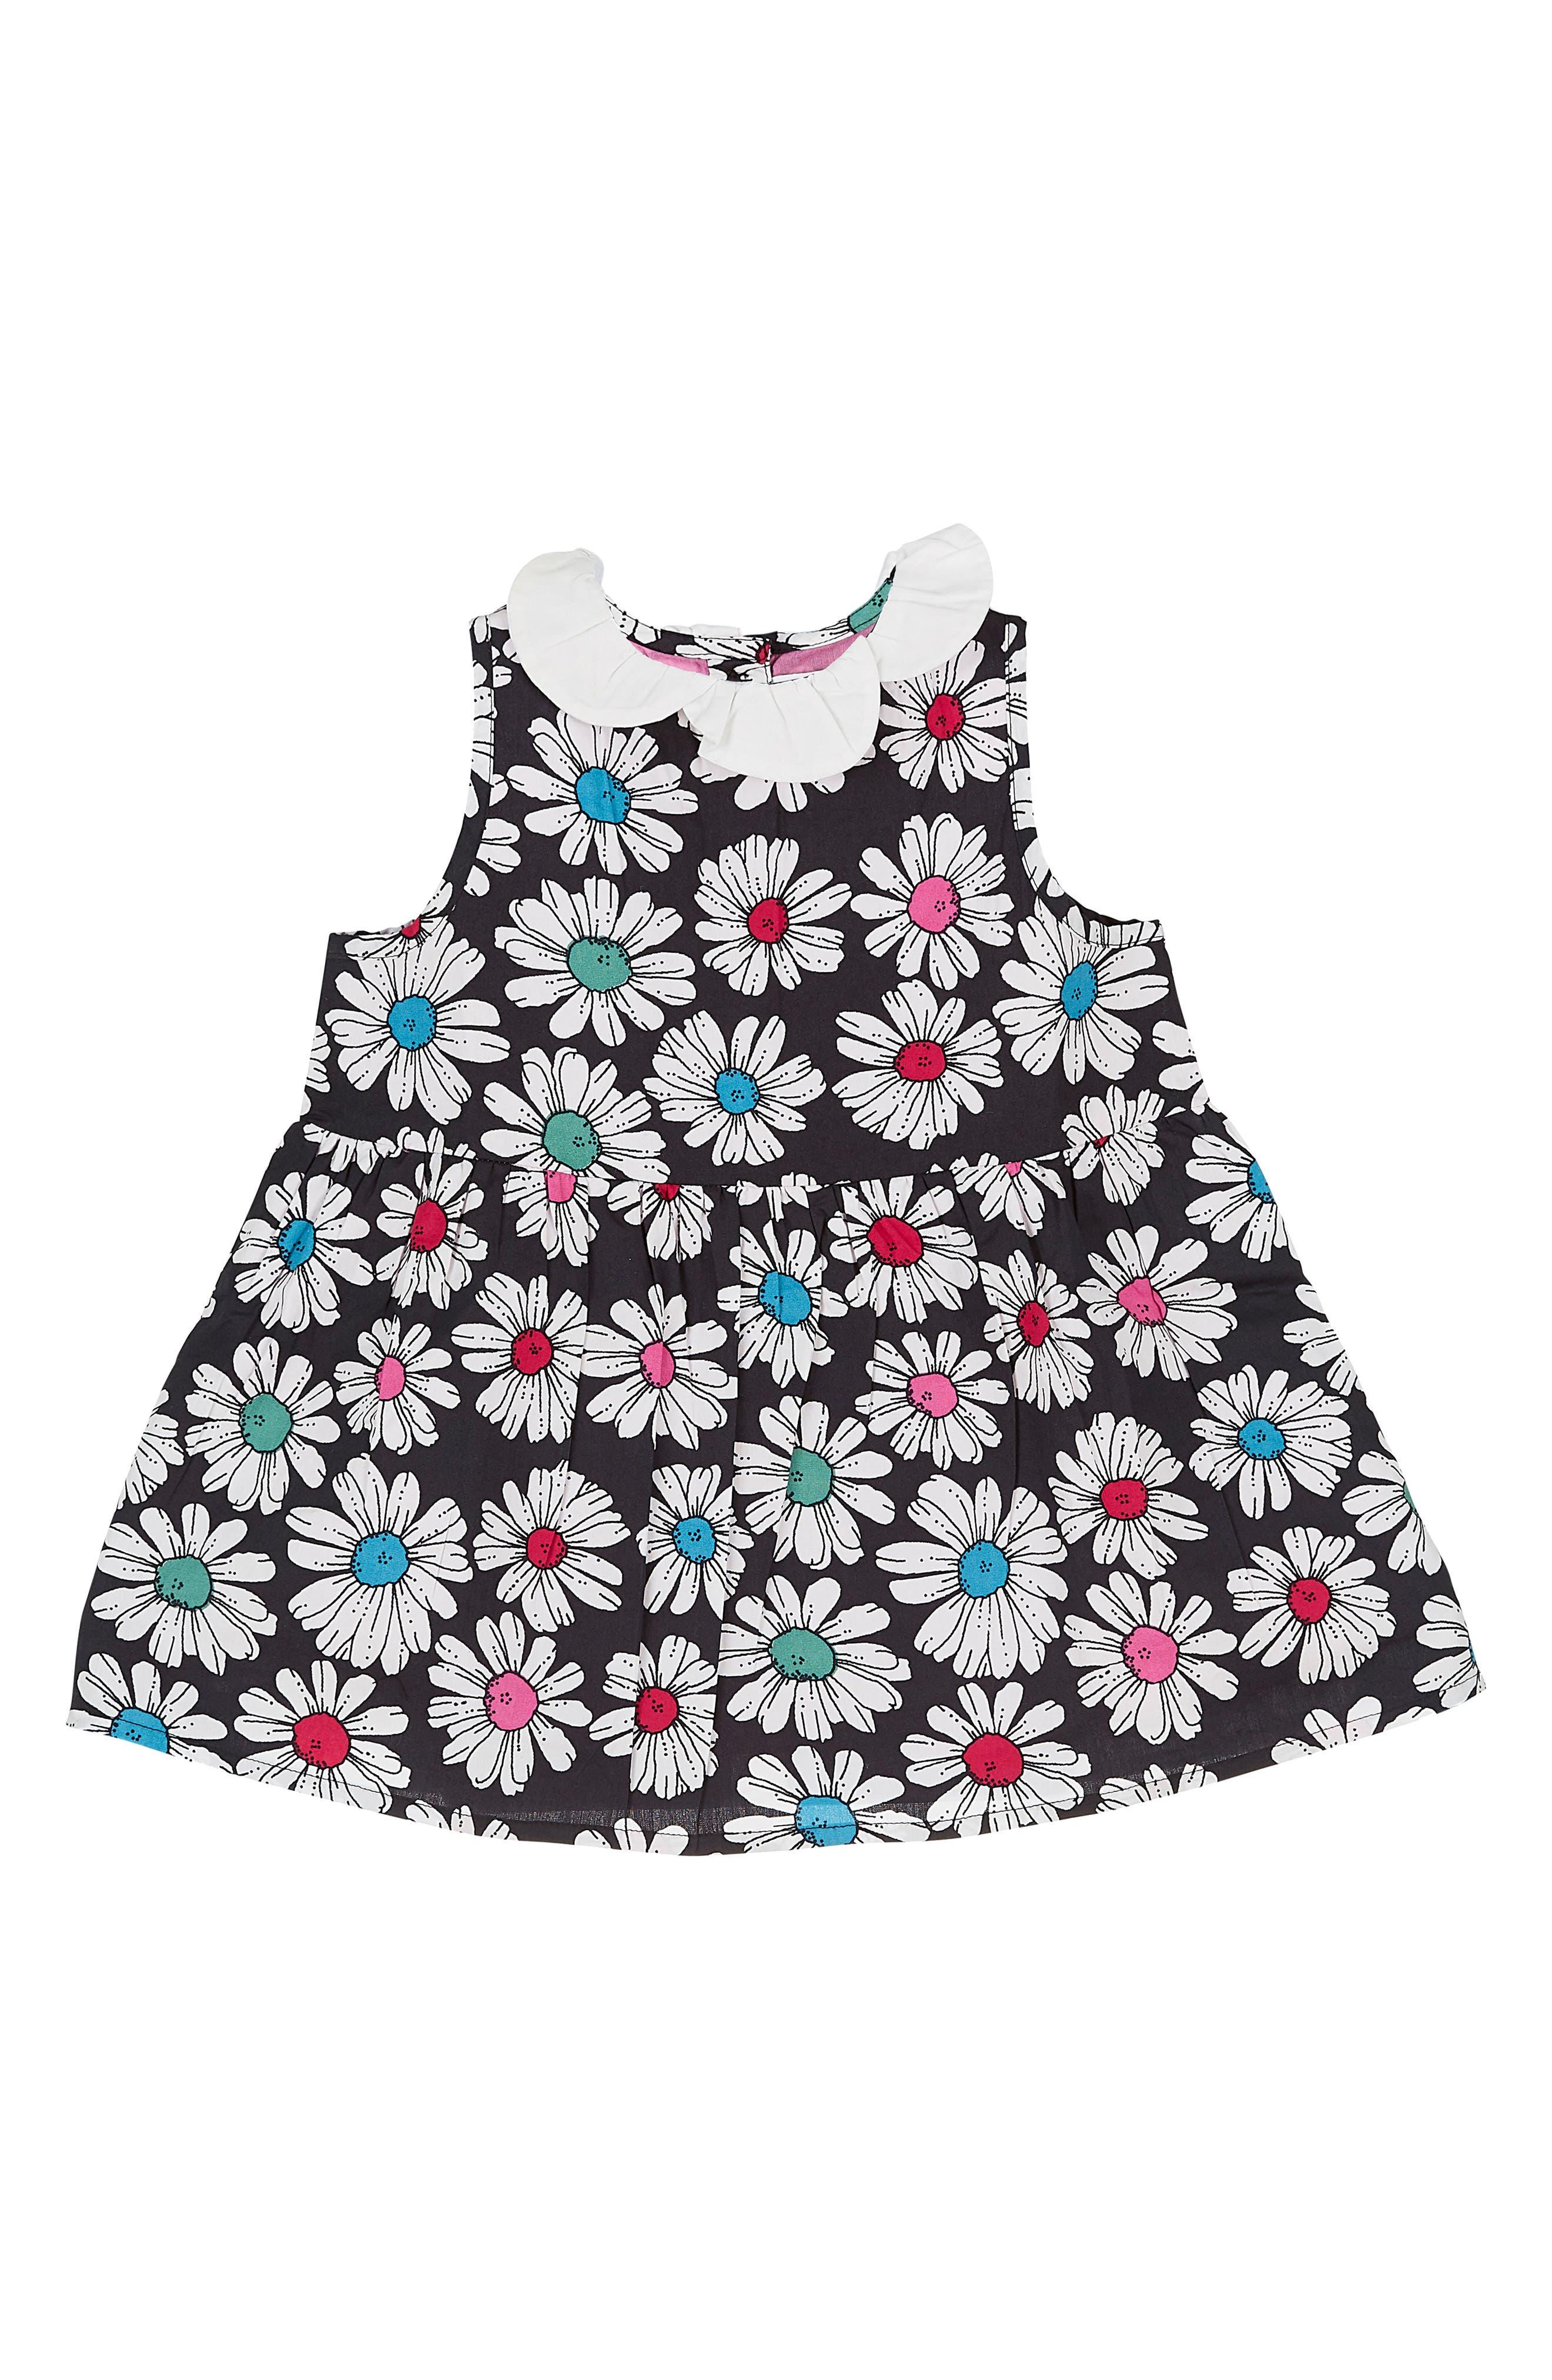 Floral Print Dress,                             Main thumbnail 1, color,                             Optical Daisy